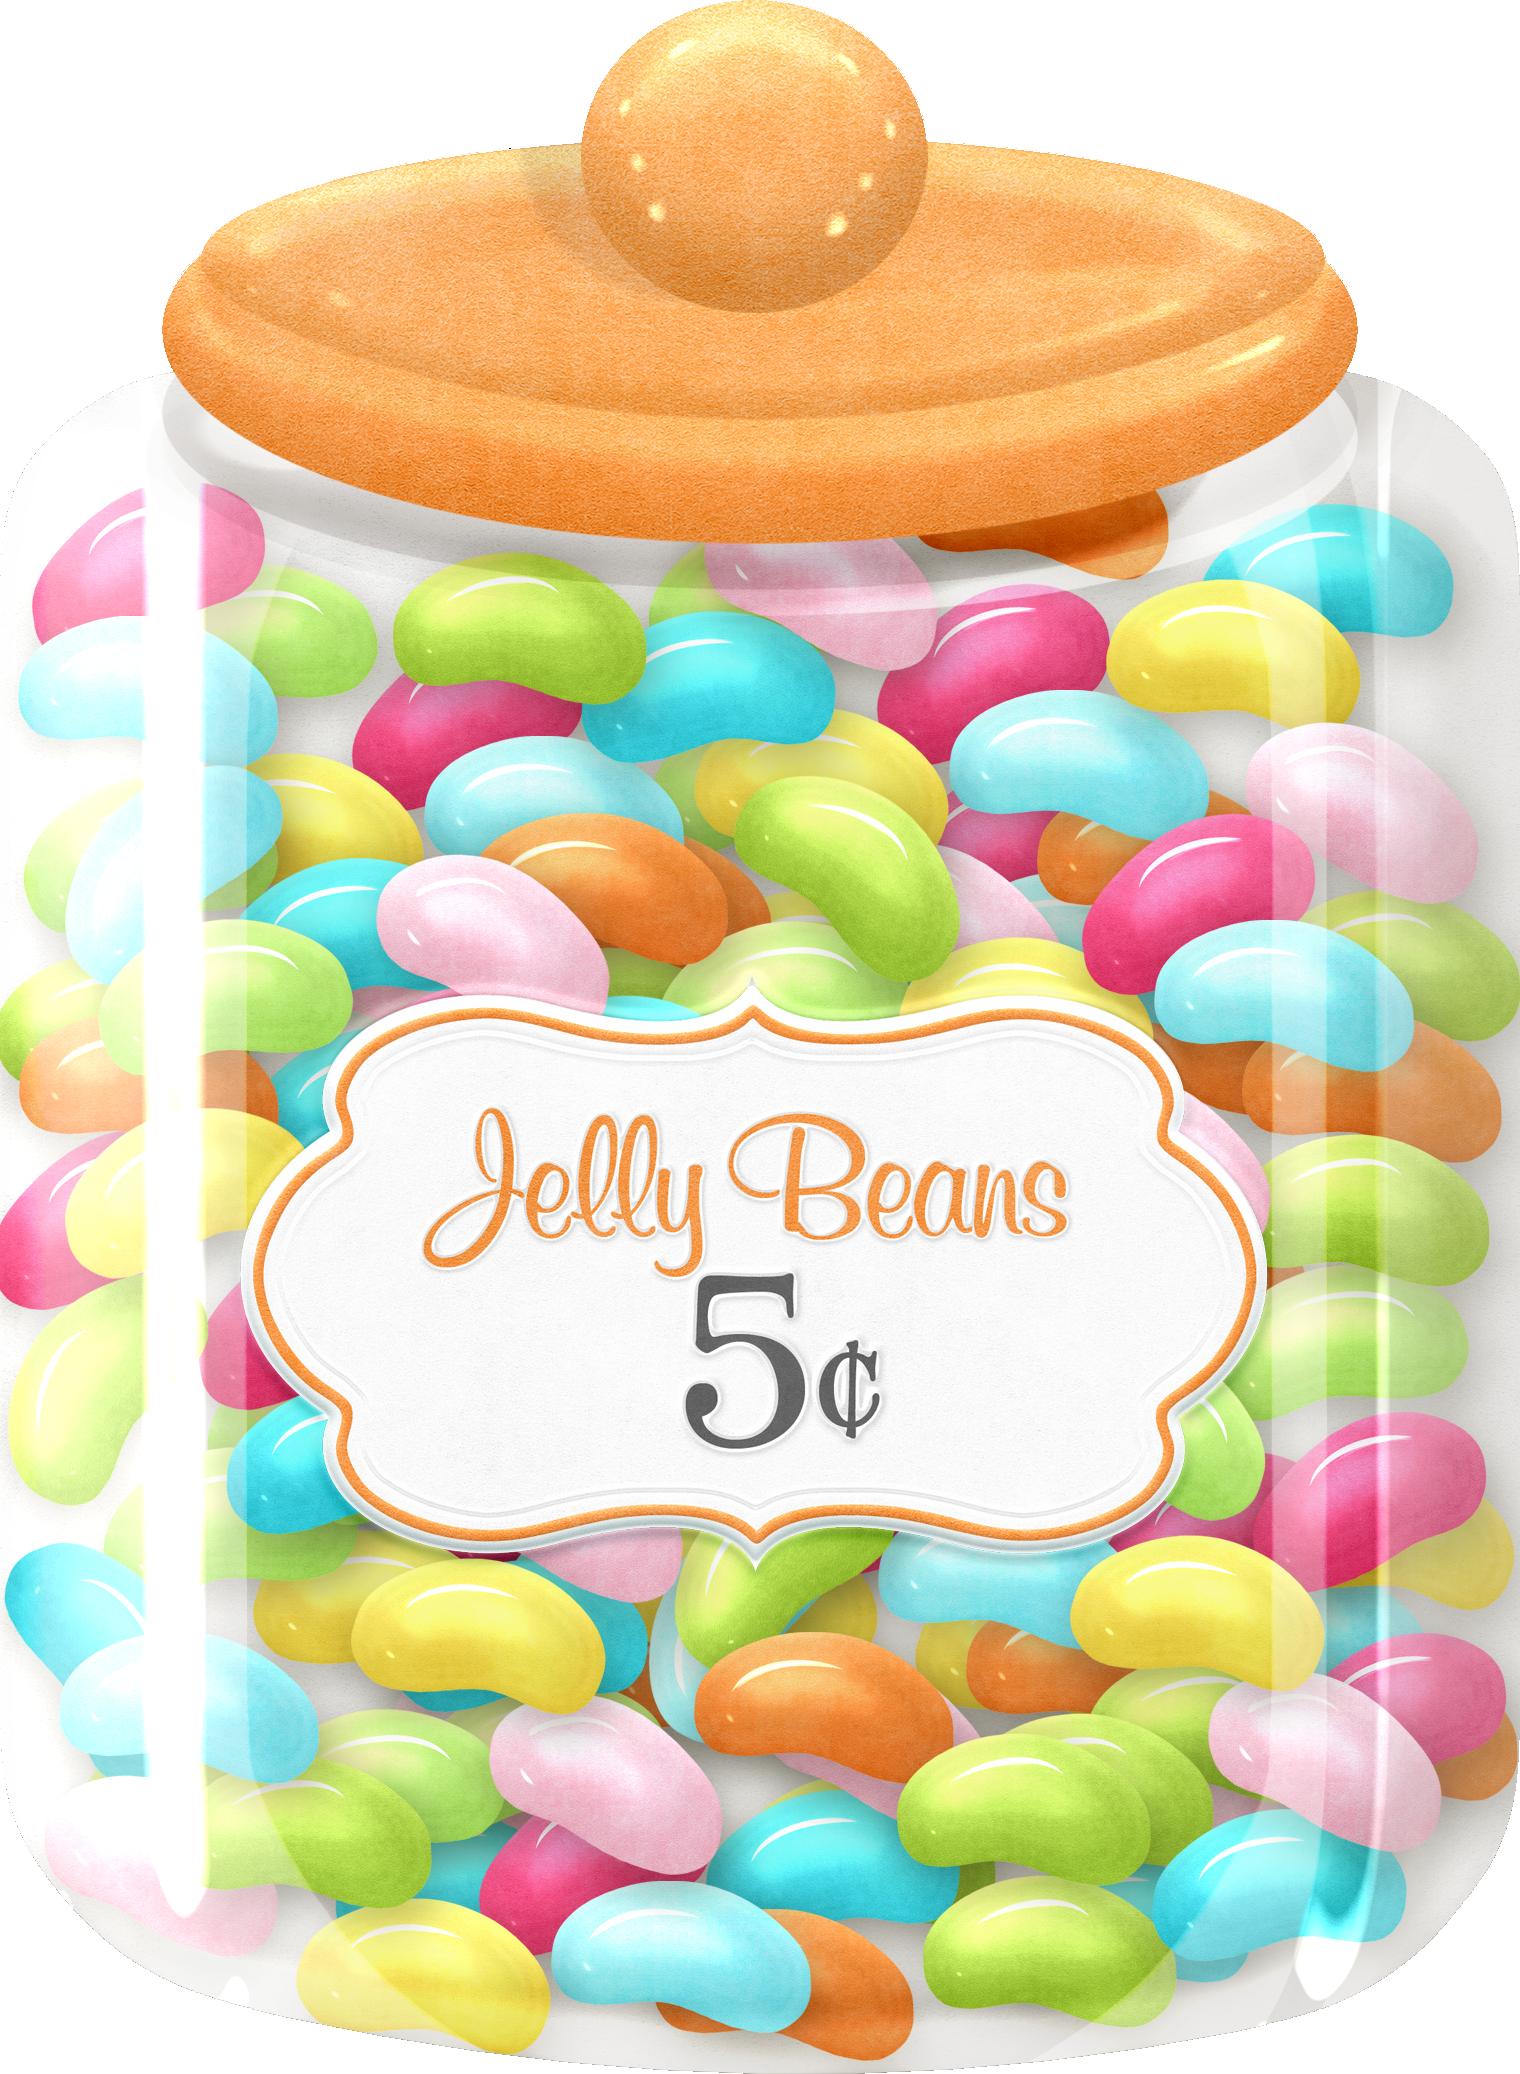 Gelatin dessert cupcake candy. Jelly clipart jelly jar